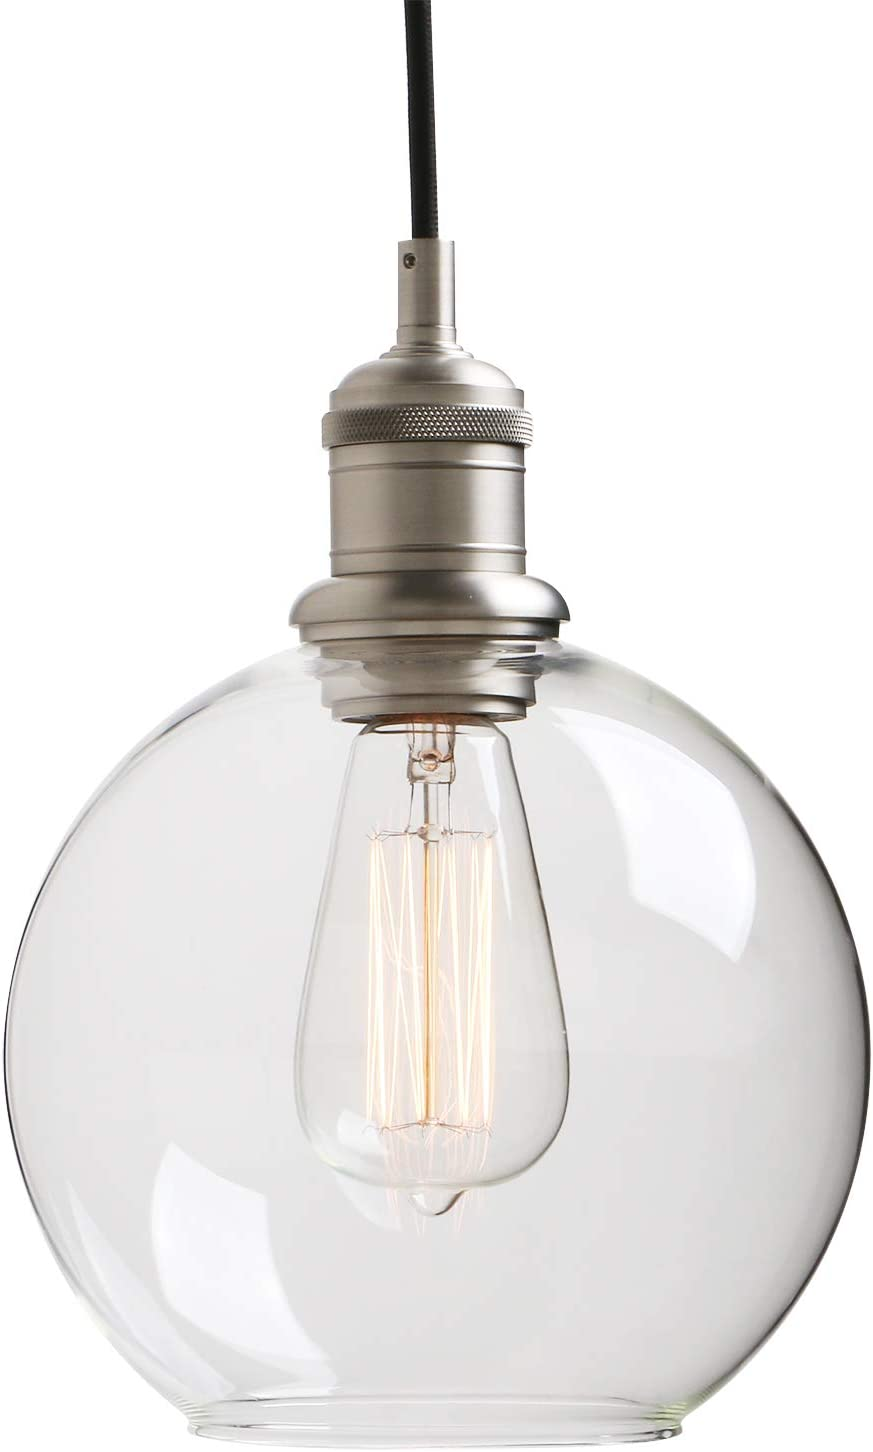 Yosoan Lighting Industrial Vintage Globe Pendant Light Fittings Loft Bar Edison Hanging Ceiling Lights Decorative Lighting For For Kitchen Island Living Room Bedroom Dining Room Brushed Amazon Co Uk Lighting